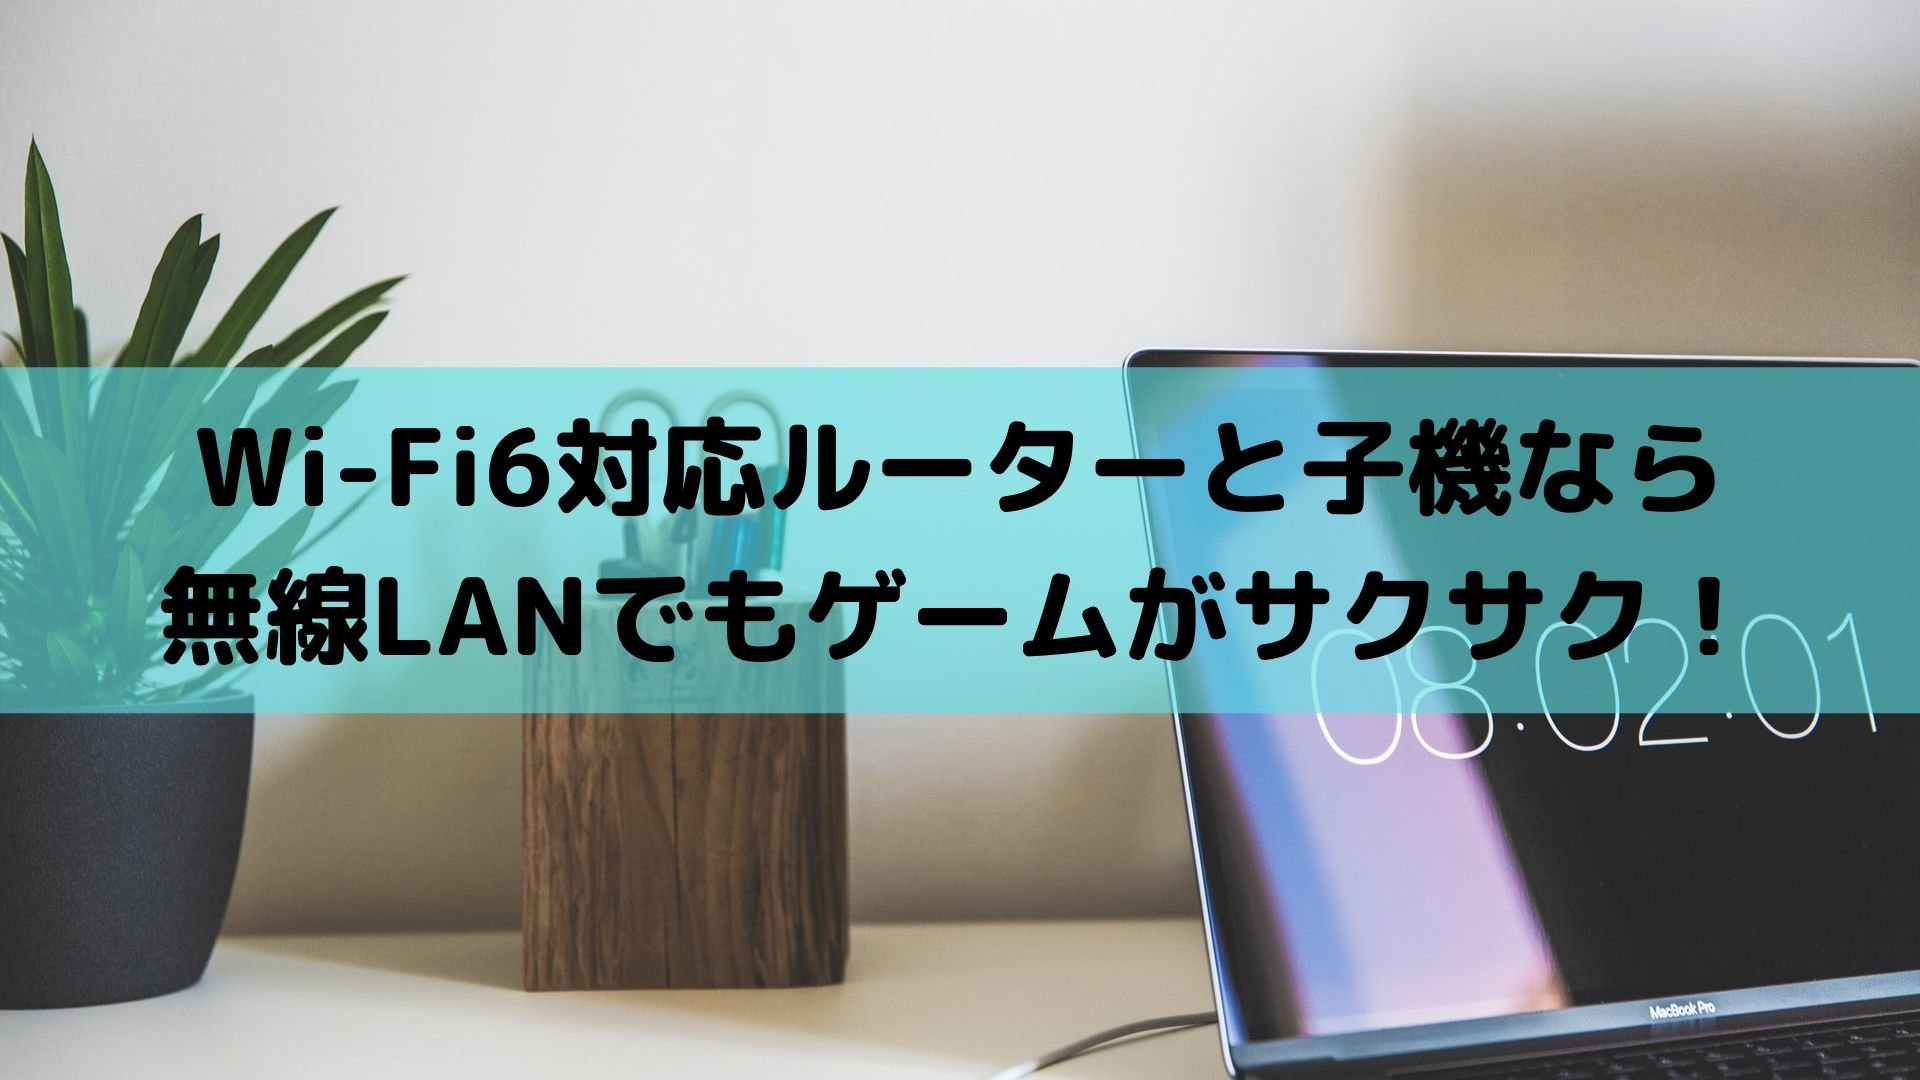 Wi-Fi6対応ルーターと子機なら無線LANでもゲームがサクサク!